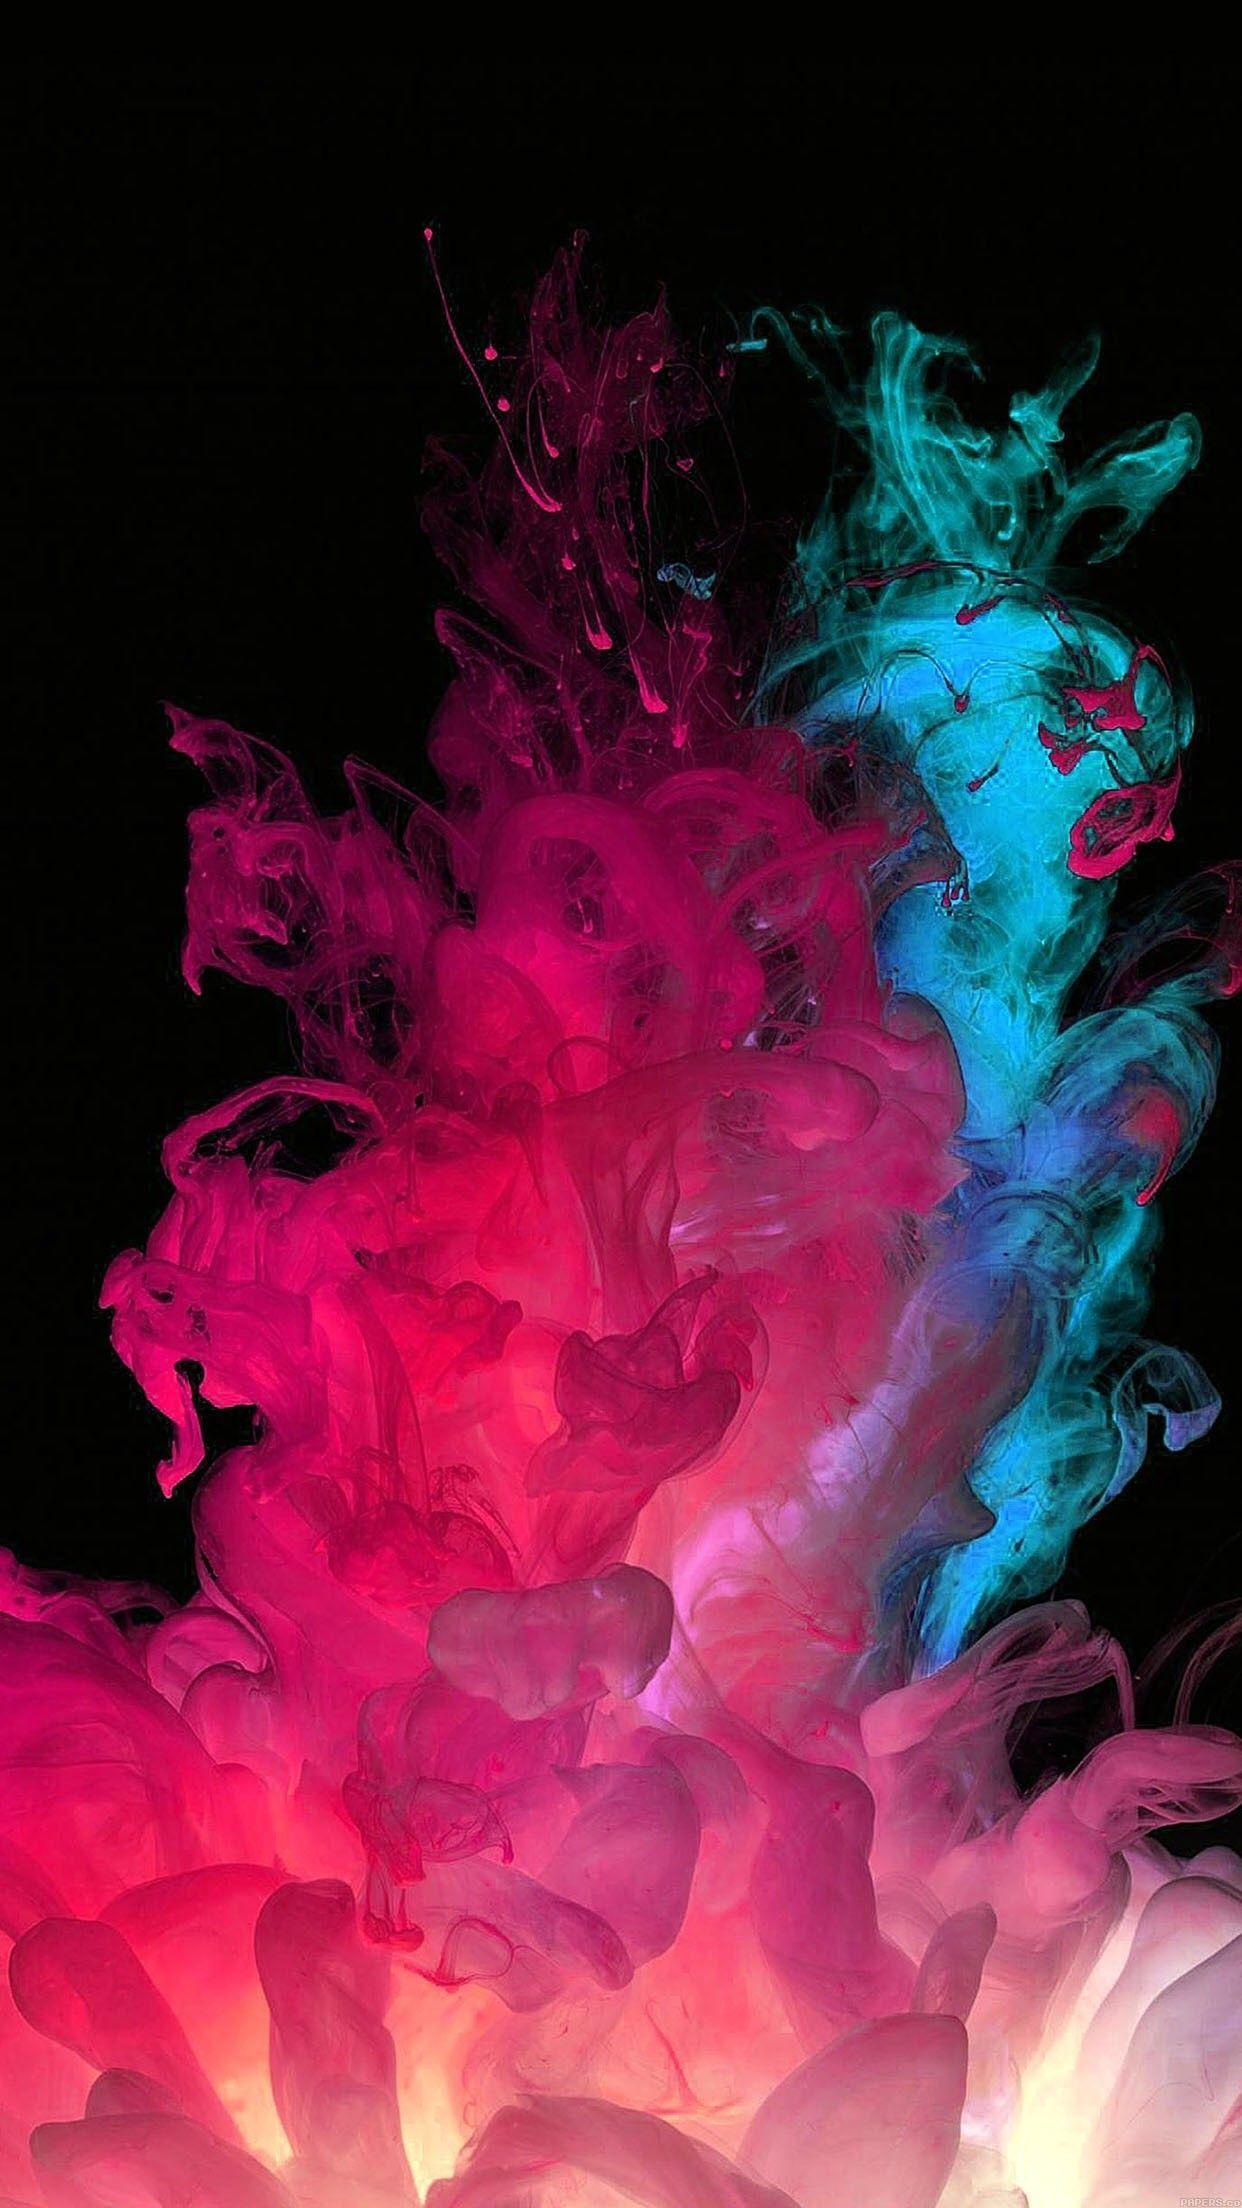 Smoke Trippy Aesthetic : smoke, trippy, aesthetic, Trippy, Smoke, Wallpapers, Backgrounds, WallpaperAccess